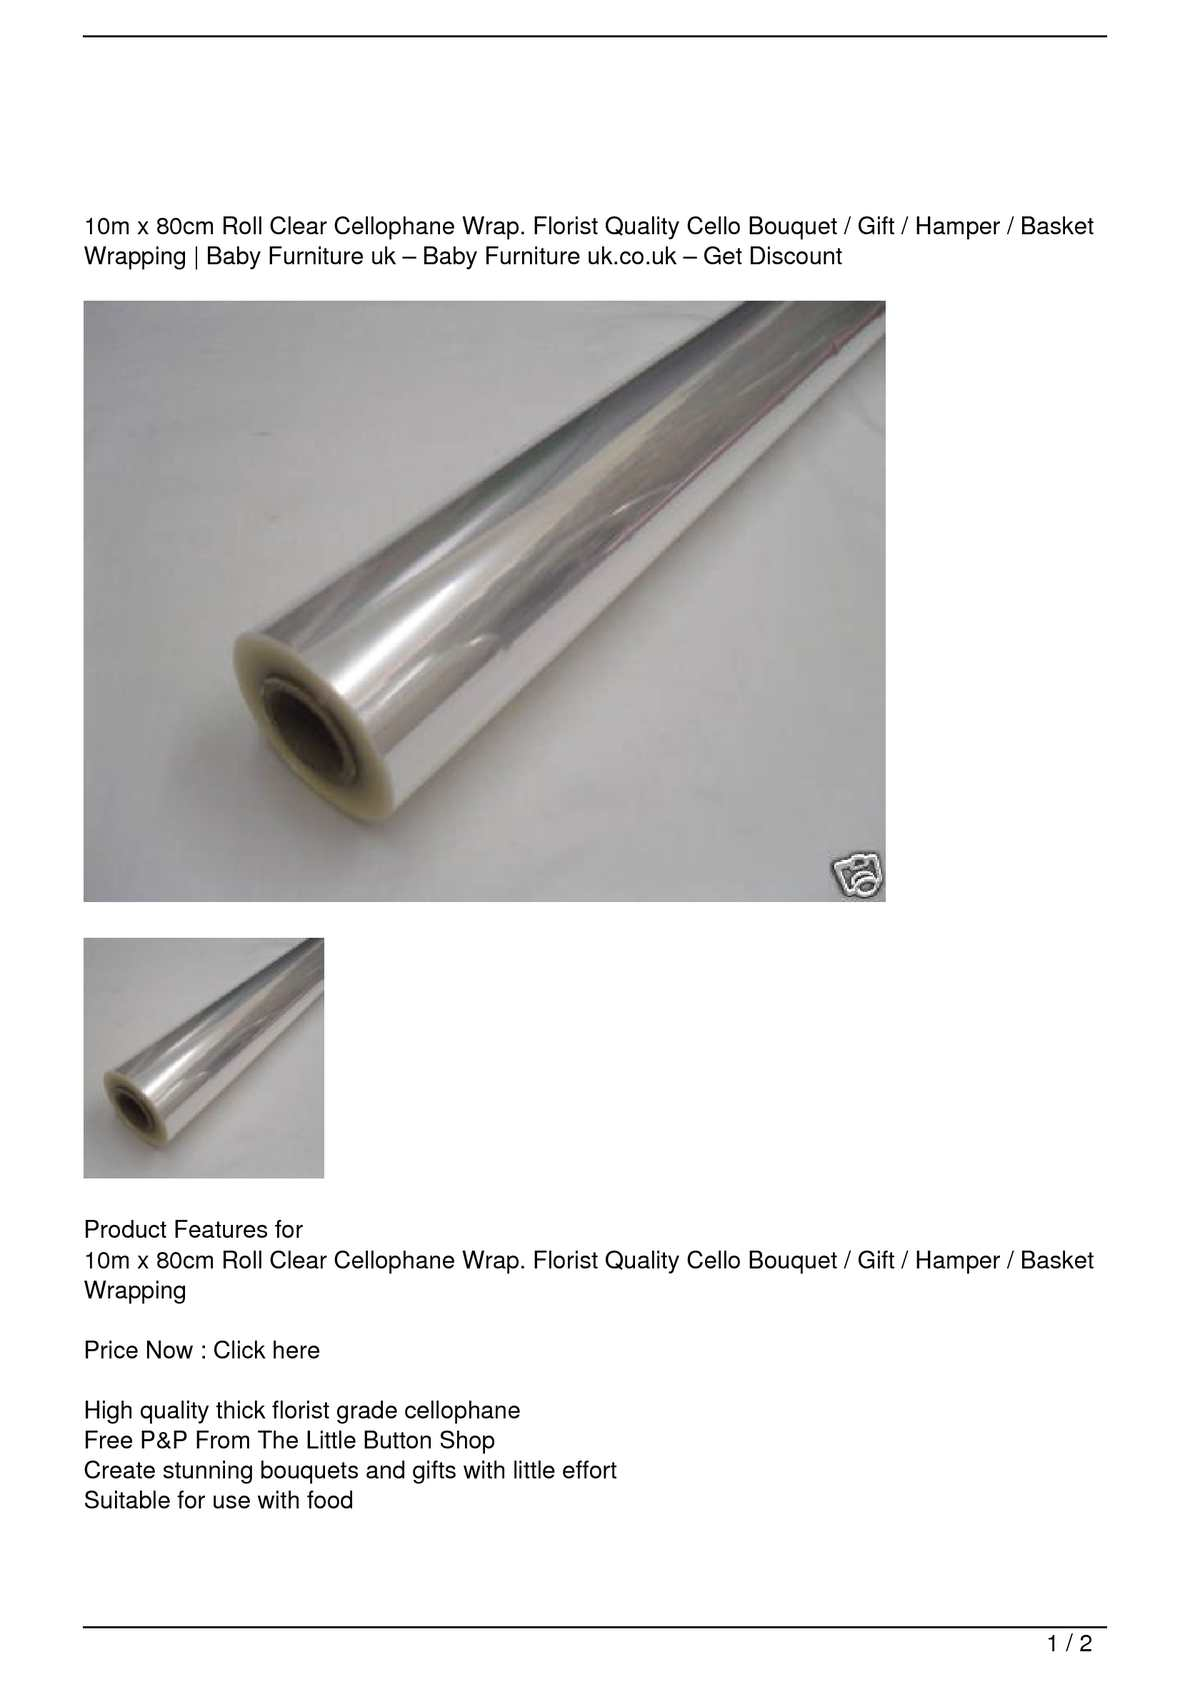 Calameo 10m X 80cm Roll Clear Cellophane Wrap Florist Quality